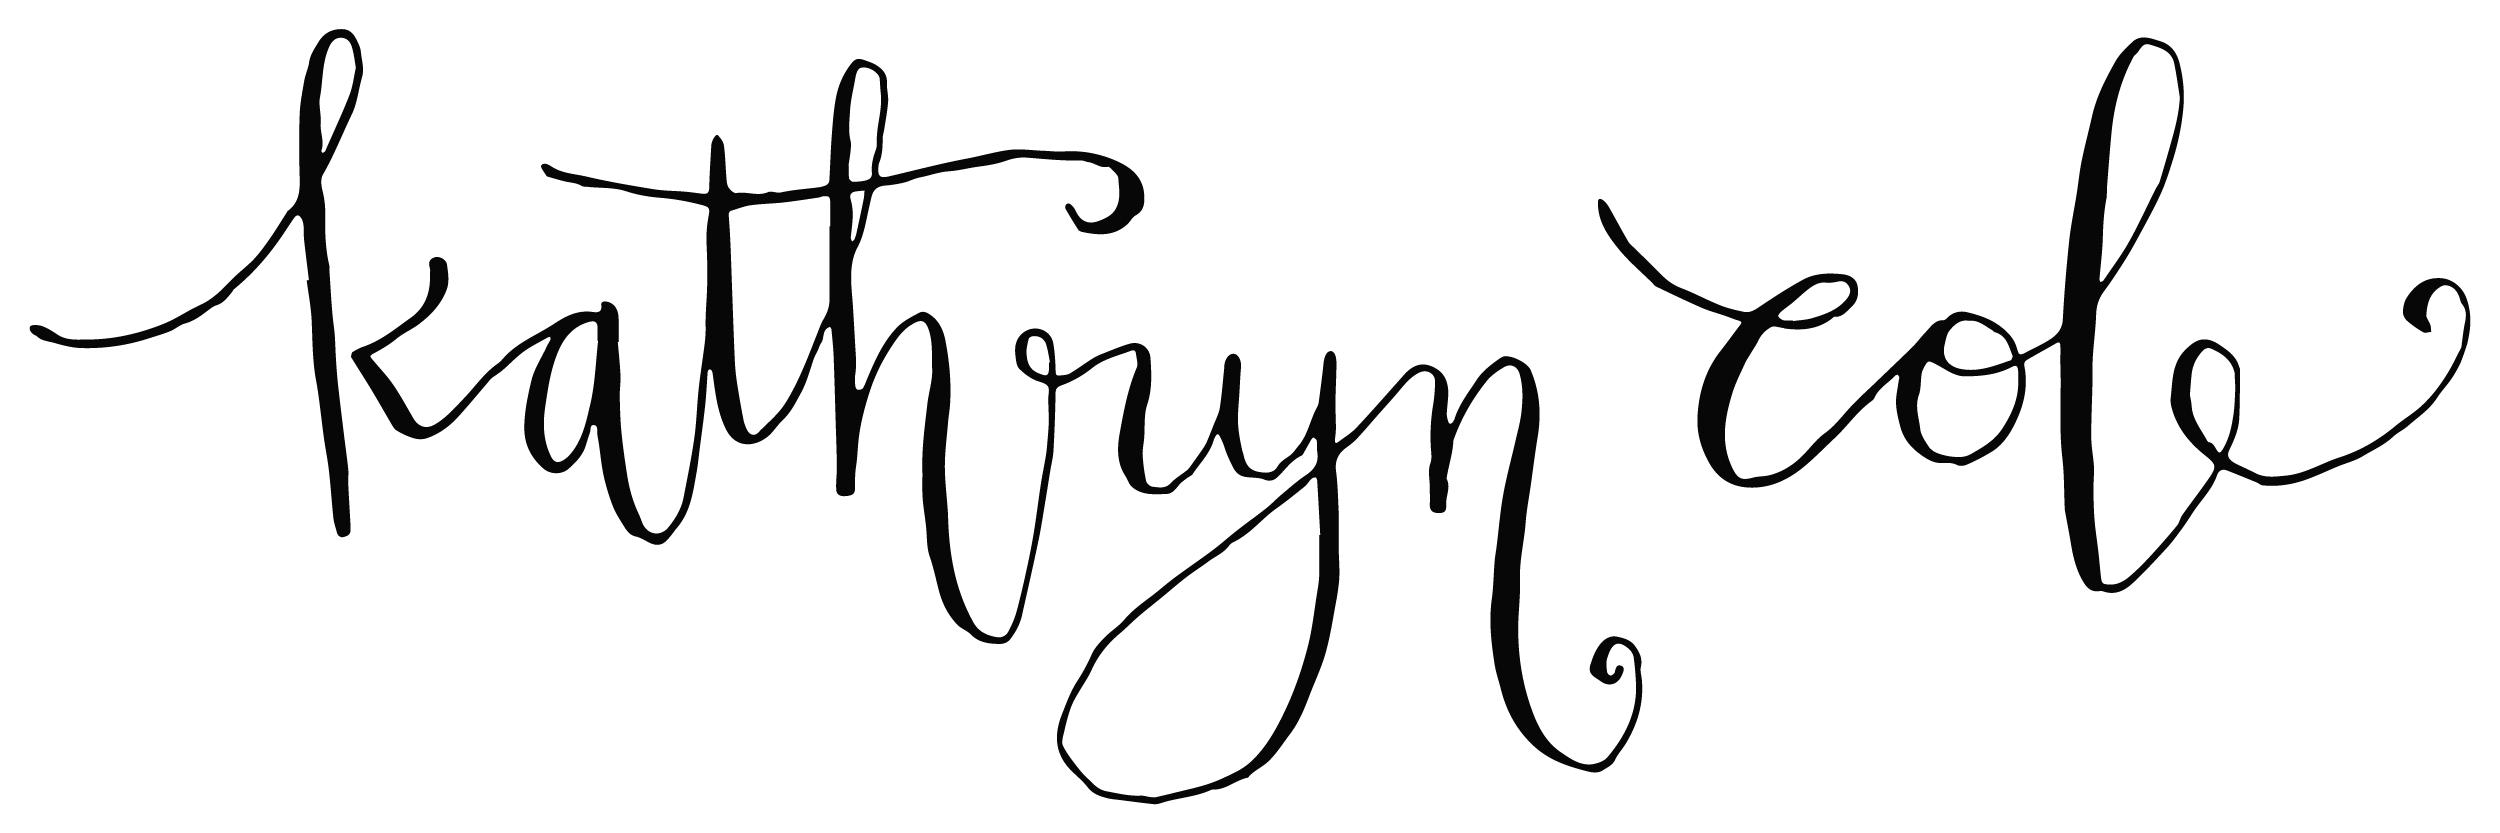 Kathryn Cole Signature